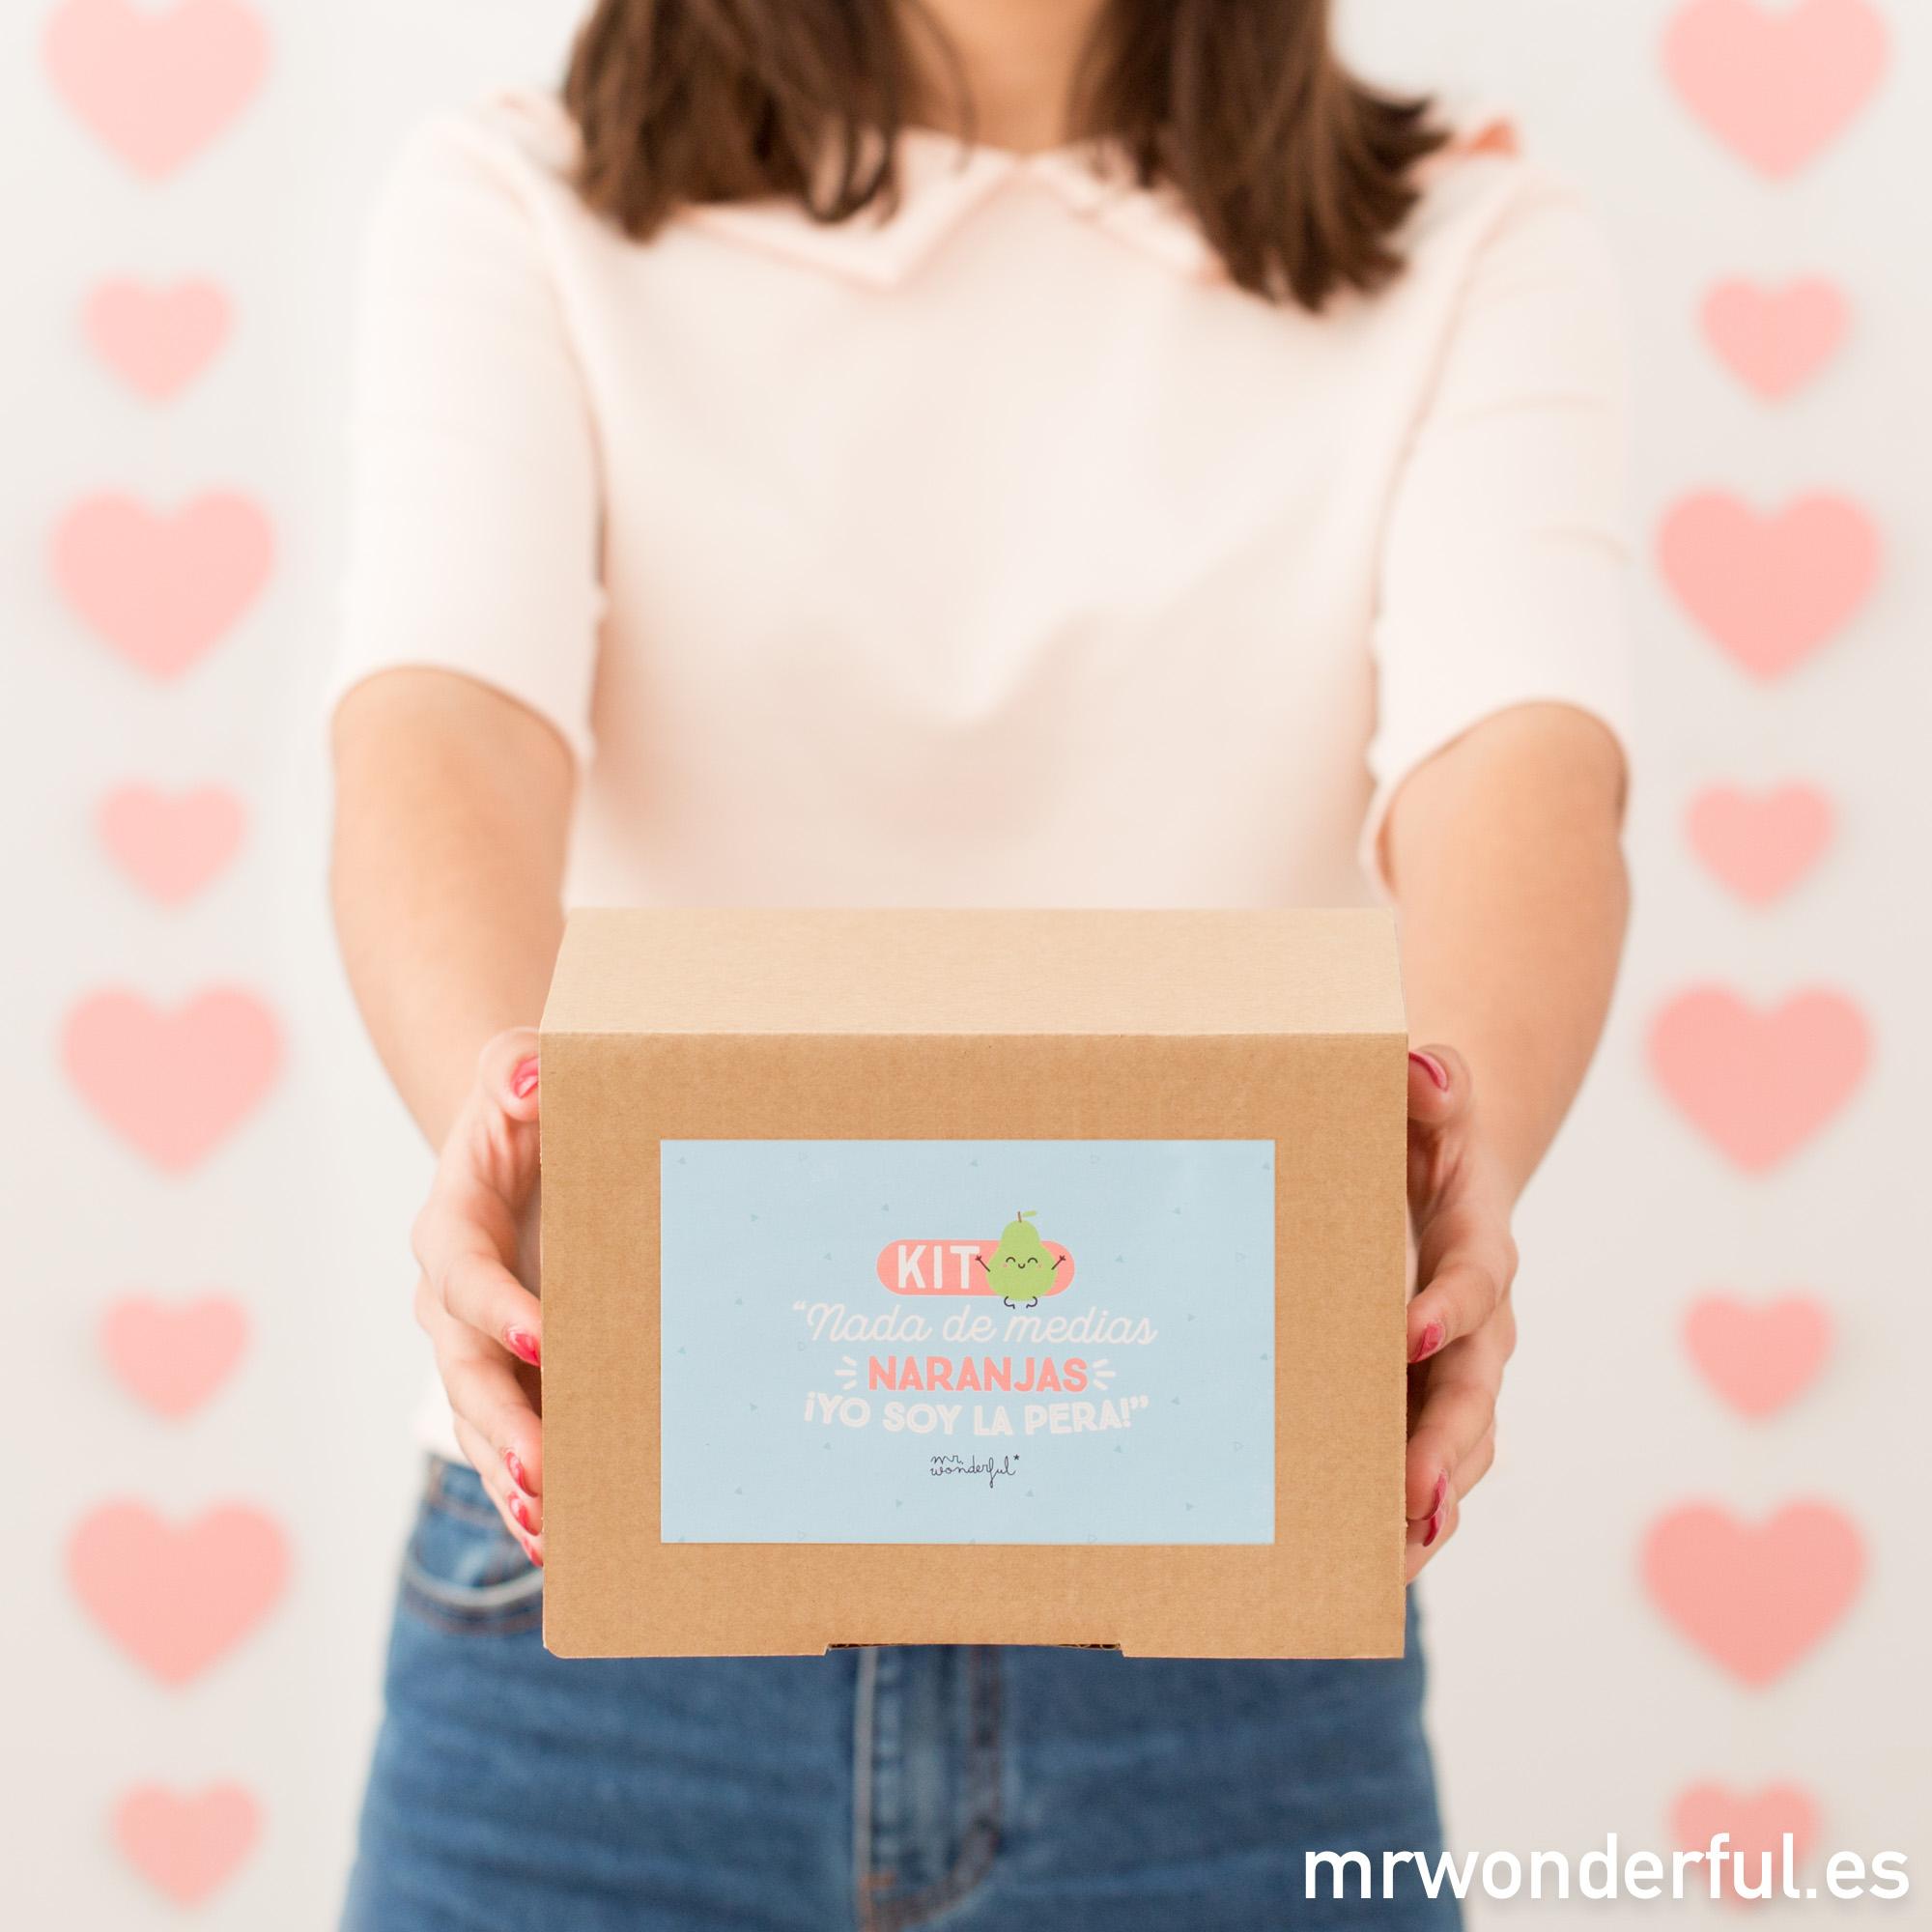 mrwonderful_kits-san-valentin_2017-43-editar